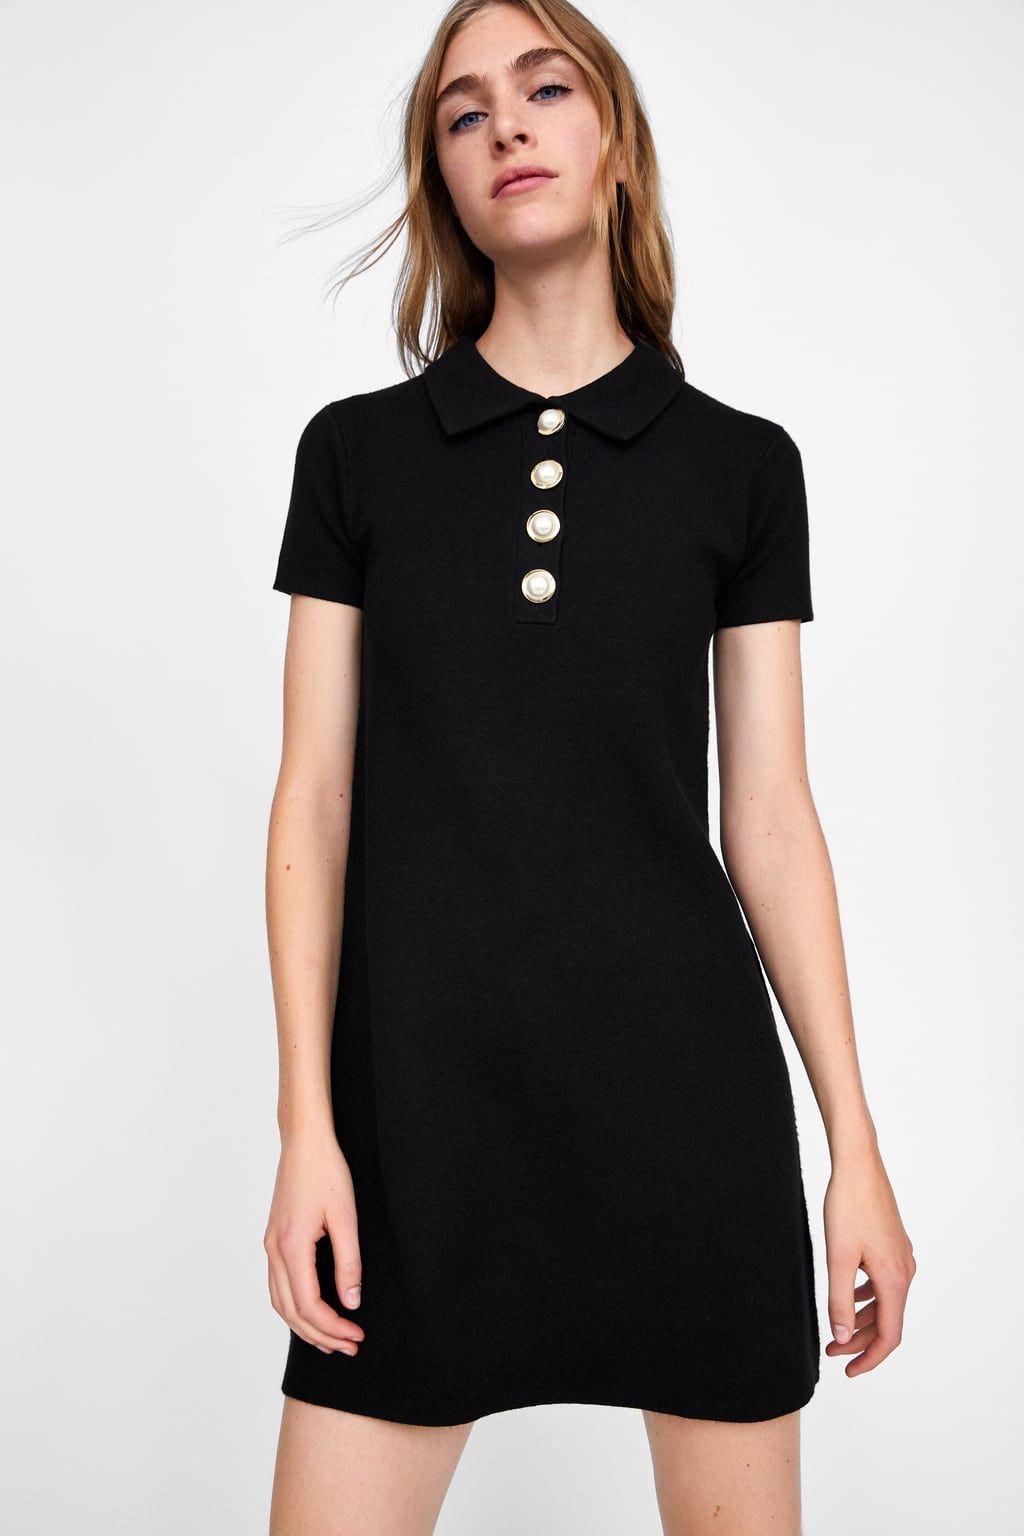 Afbeelding 2 Van Jurk Met Parels Van Zara Womens Fashion Dresses Casual Fashion Clothes Women Zara Black Dress [ 1536 x 1024 Pixel ]